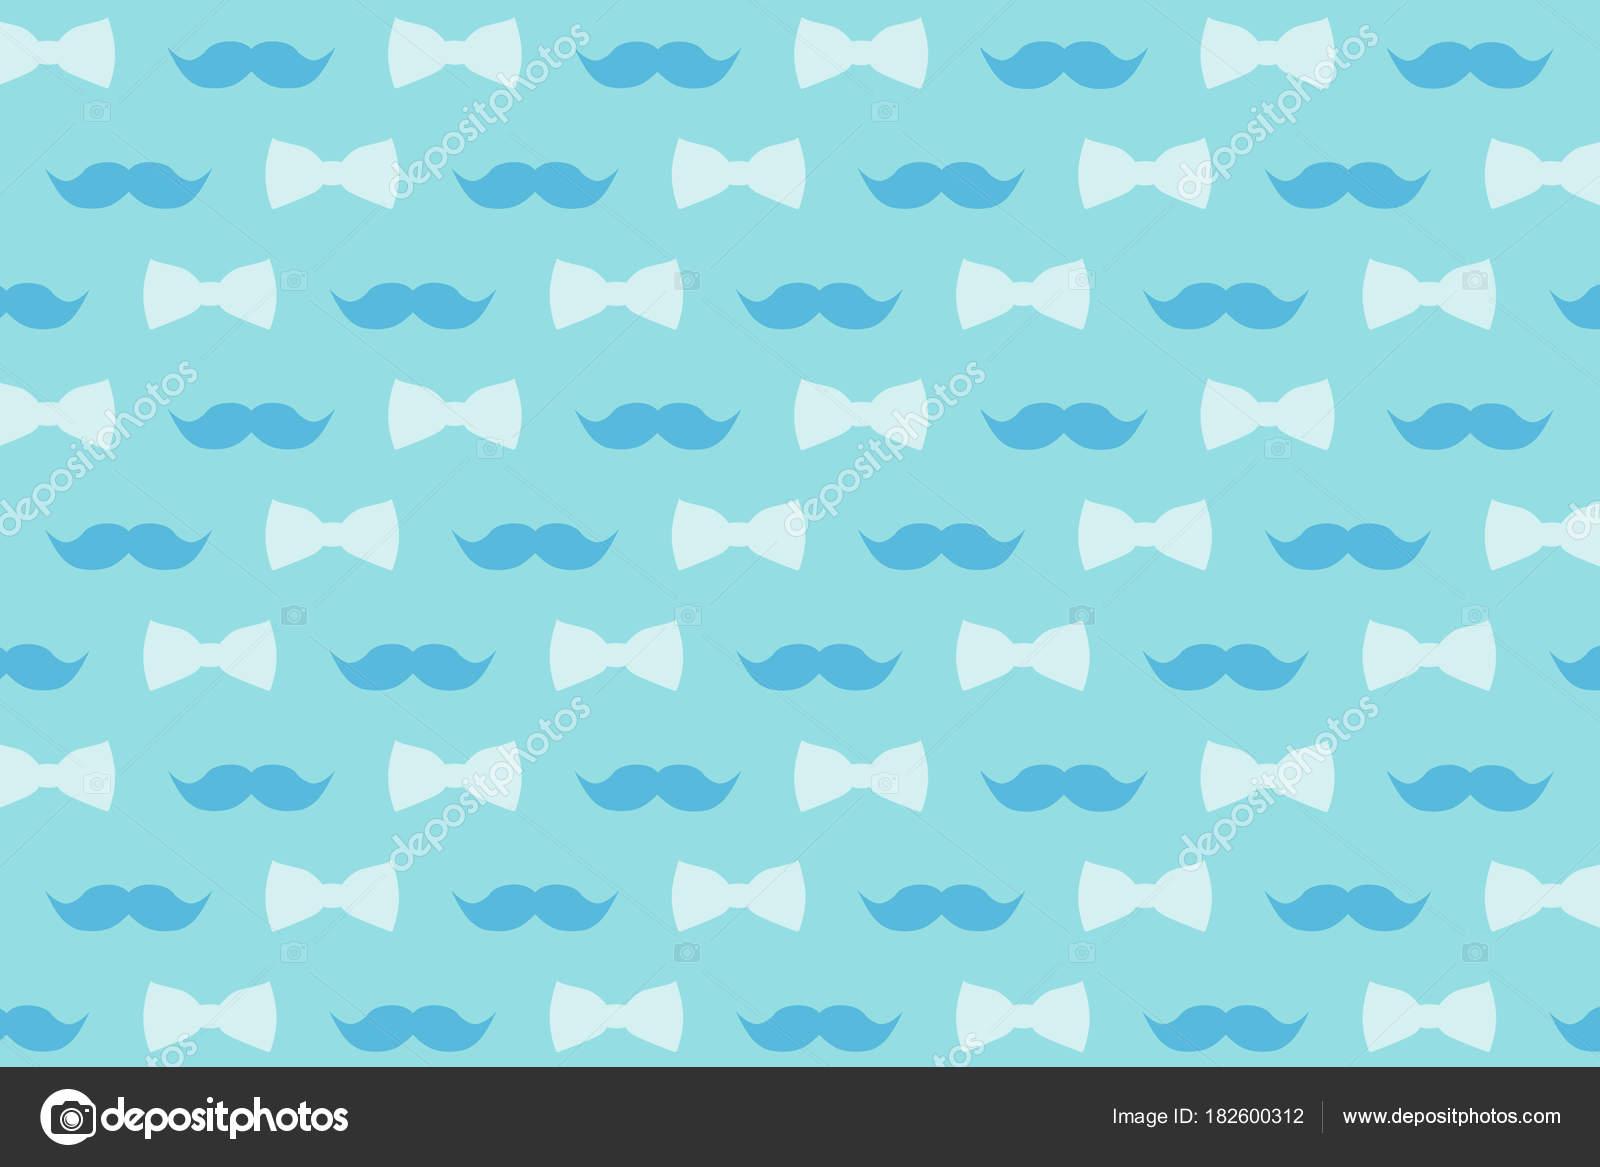 Mustache Bow Tie Gently Blue Tones Design Wallpaper Decor Stock Photo